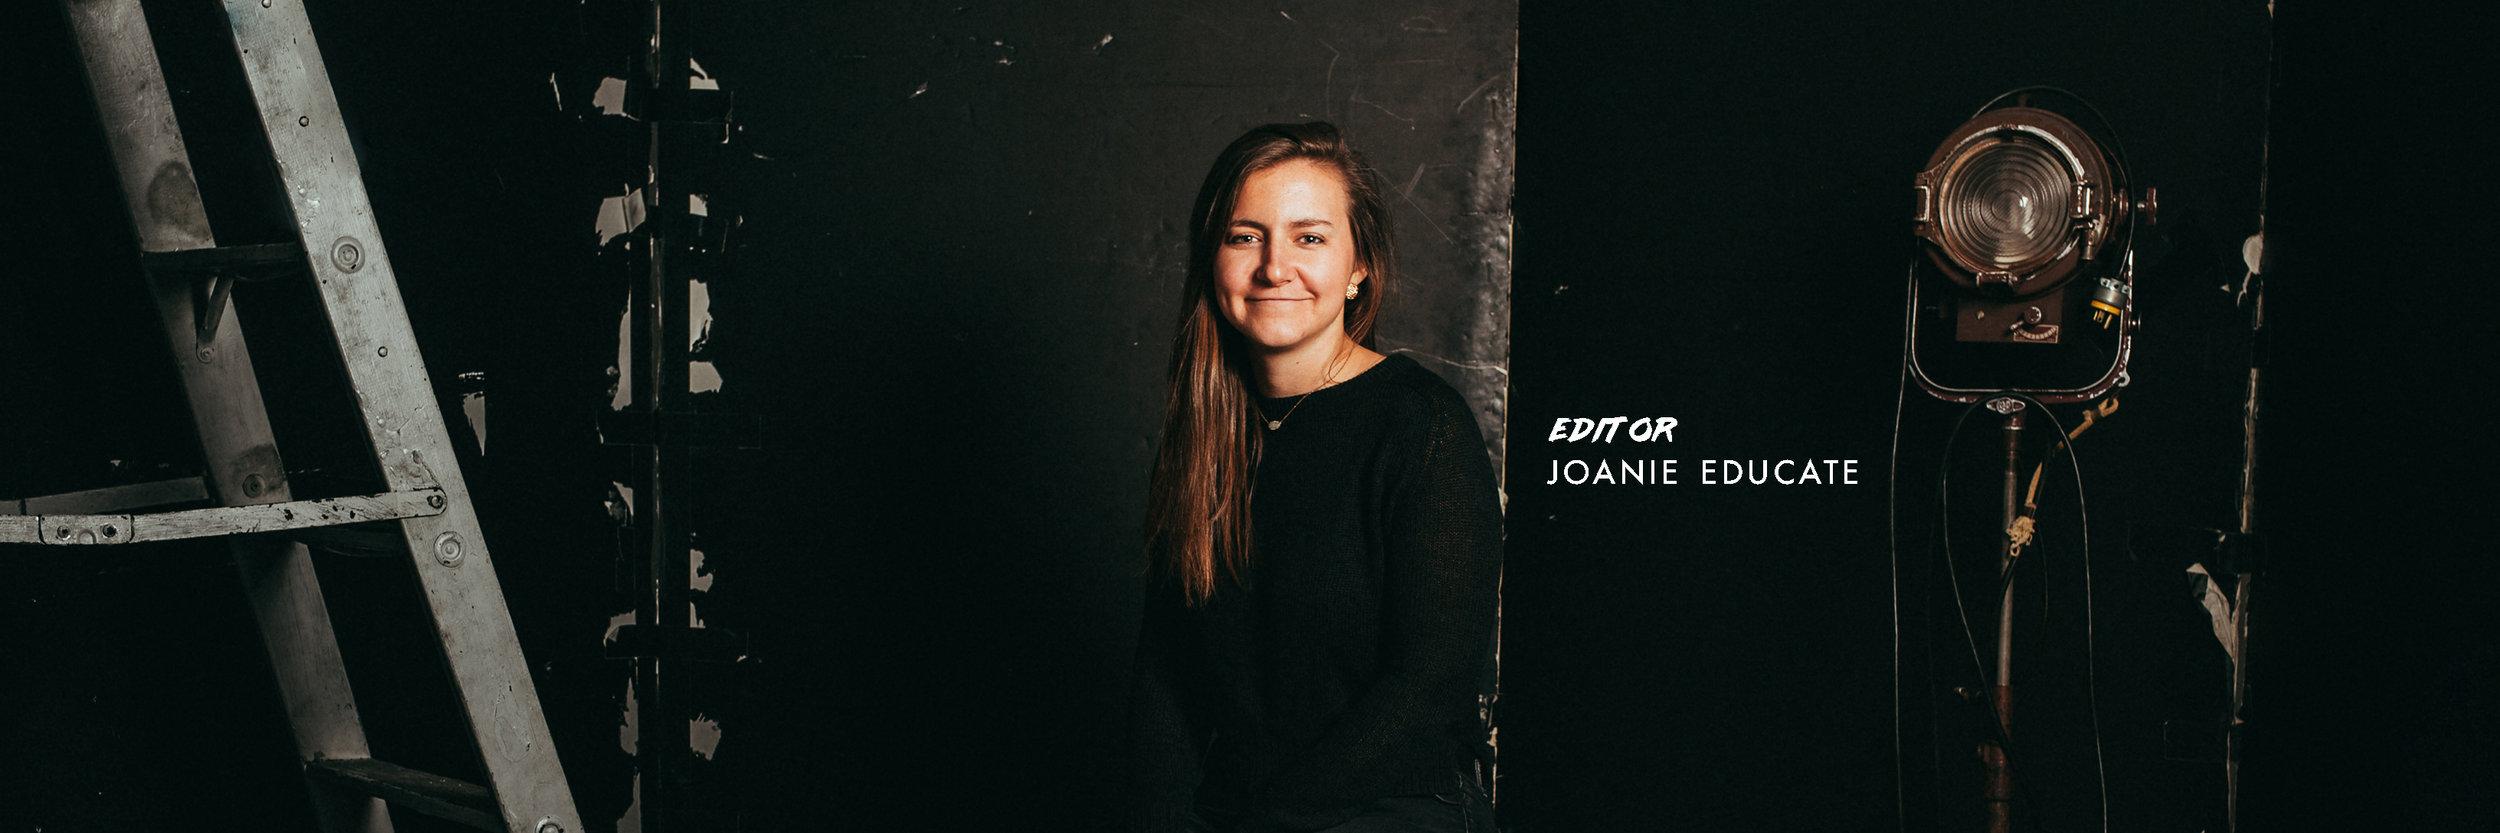 editor, joanie educate